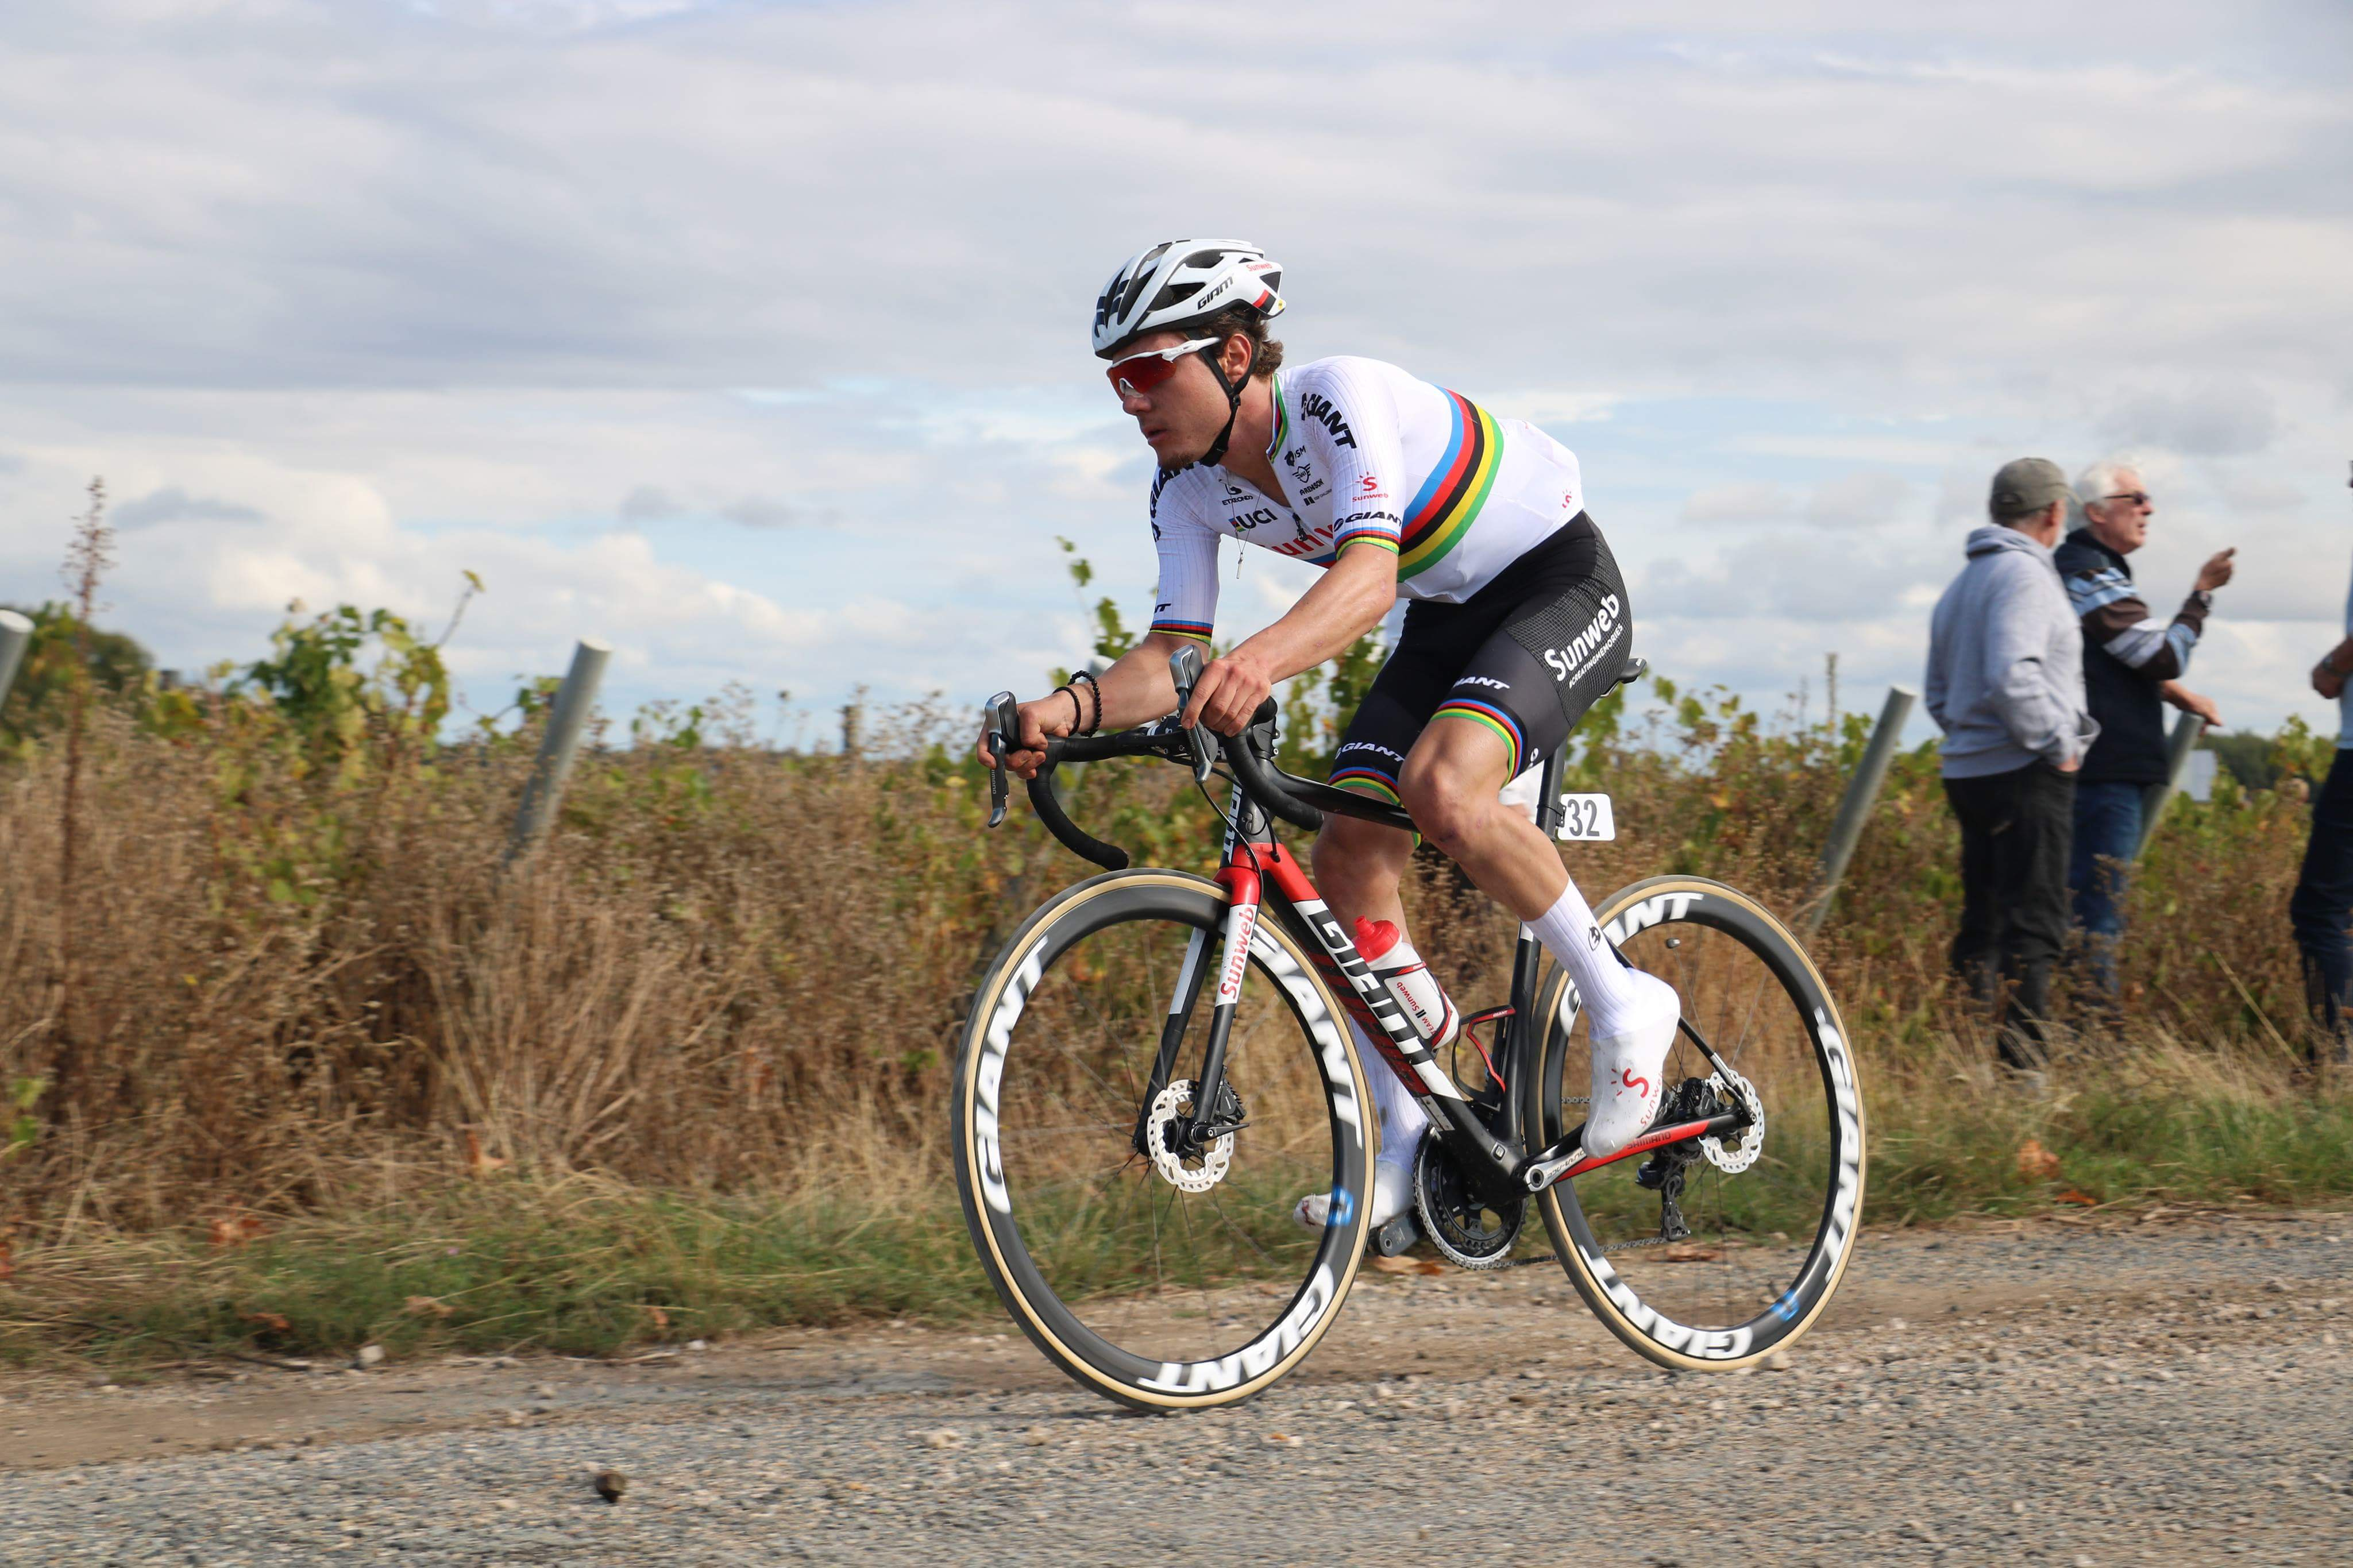 Marc Hirschi u23 world champion 2018